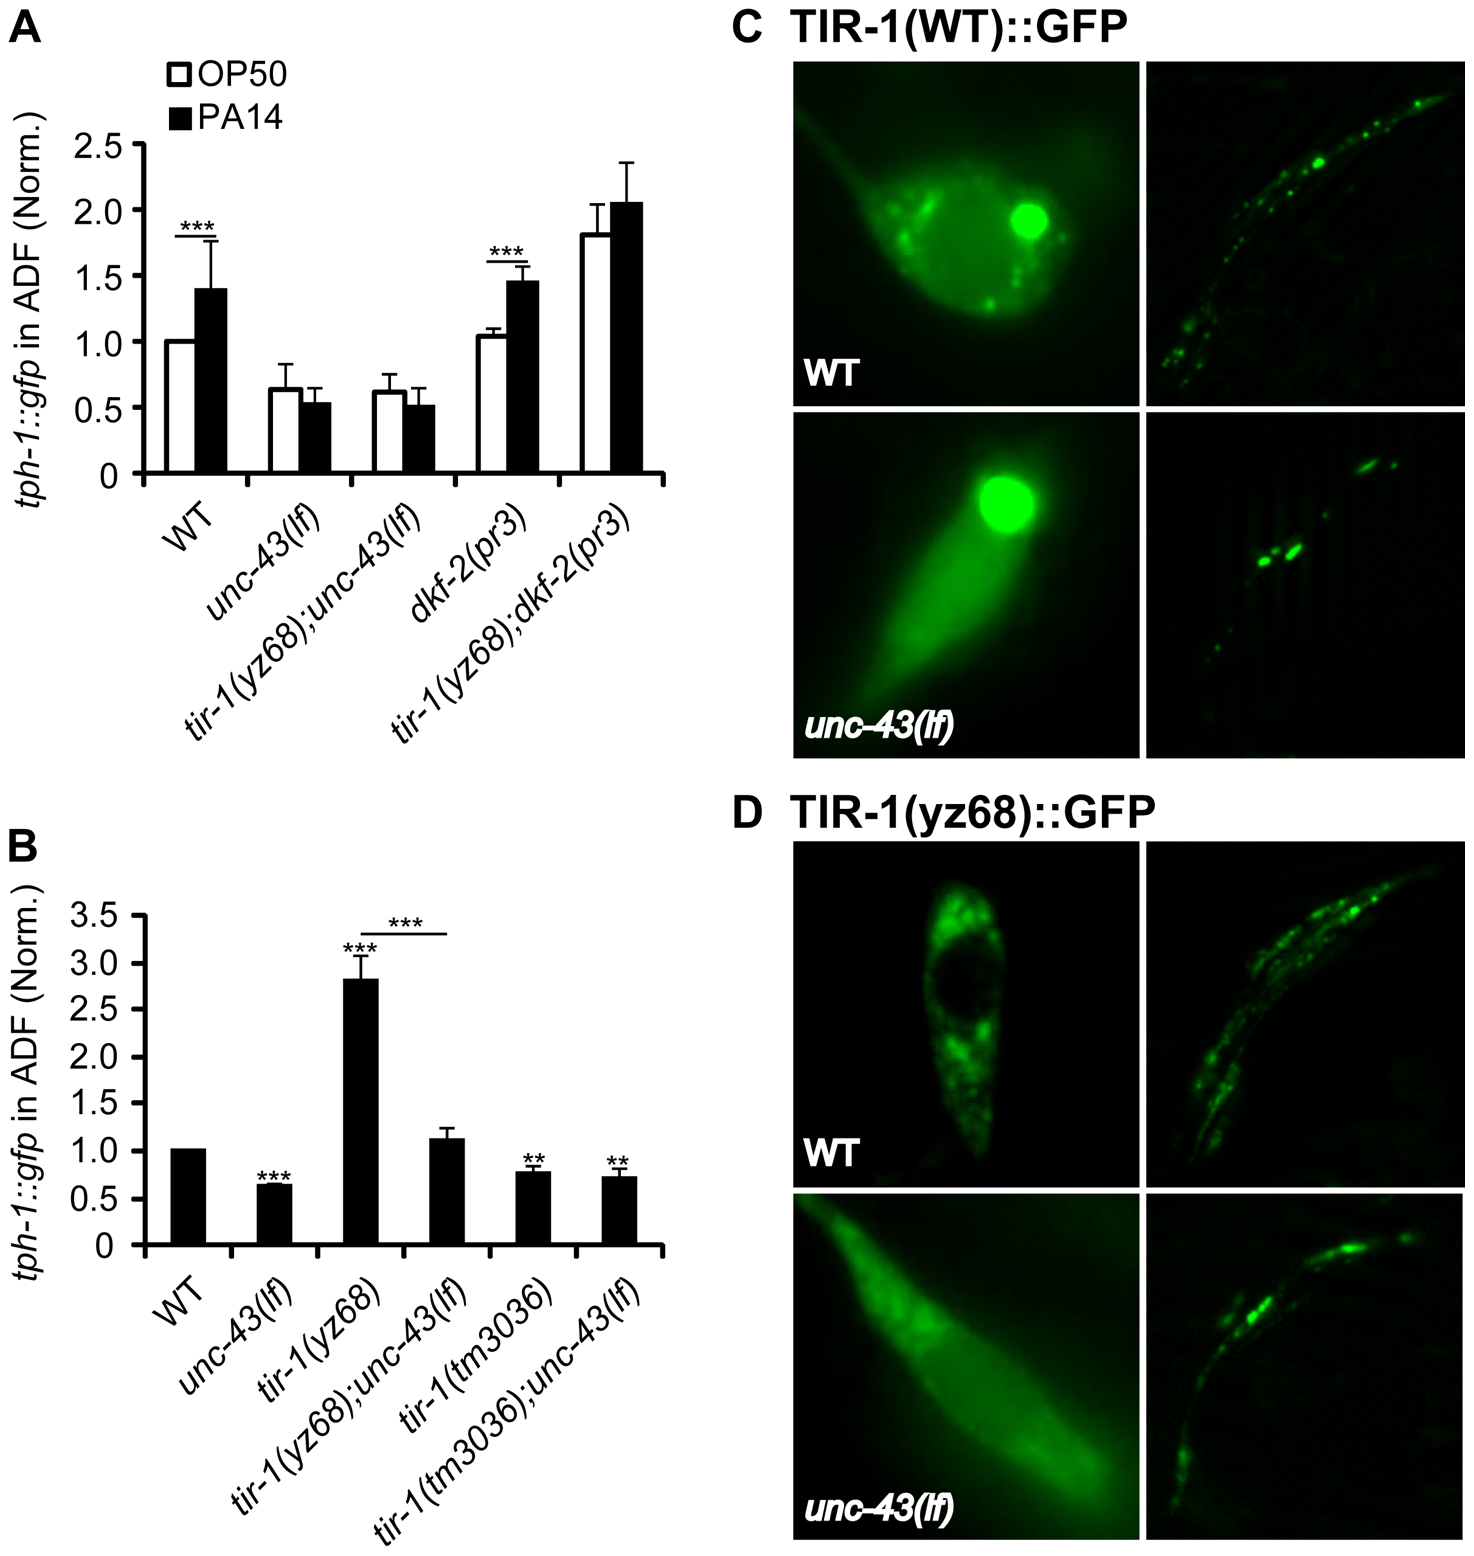 Regulation of TIR-1 signaling in ADF neurons.